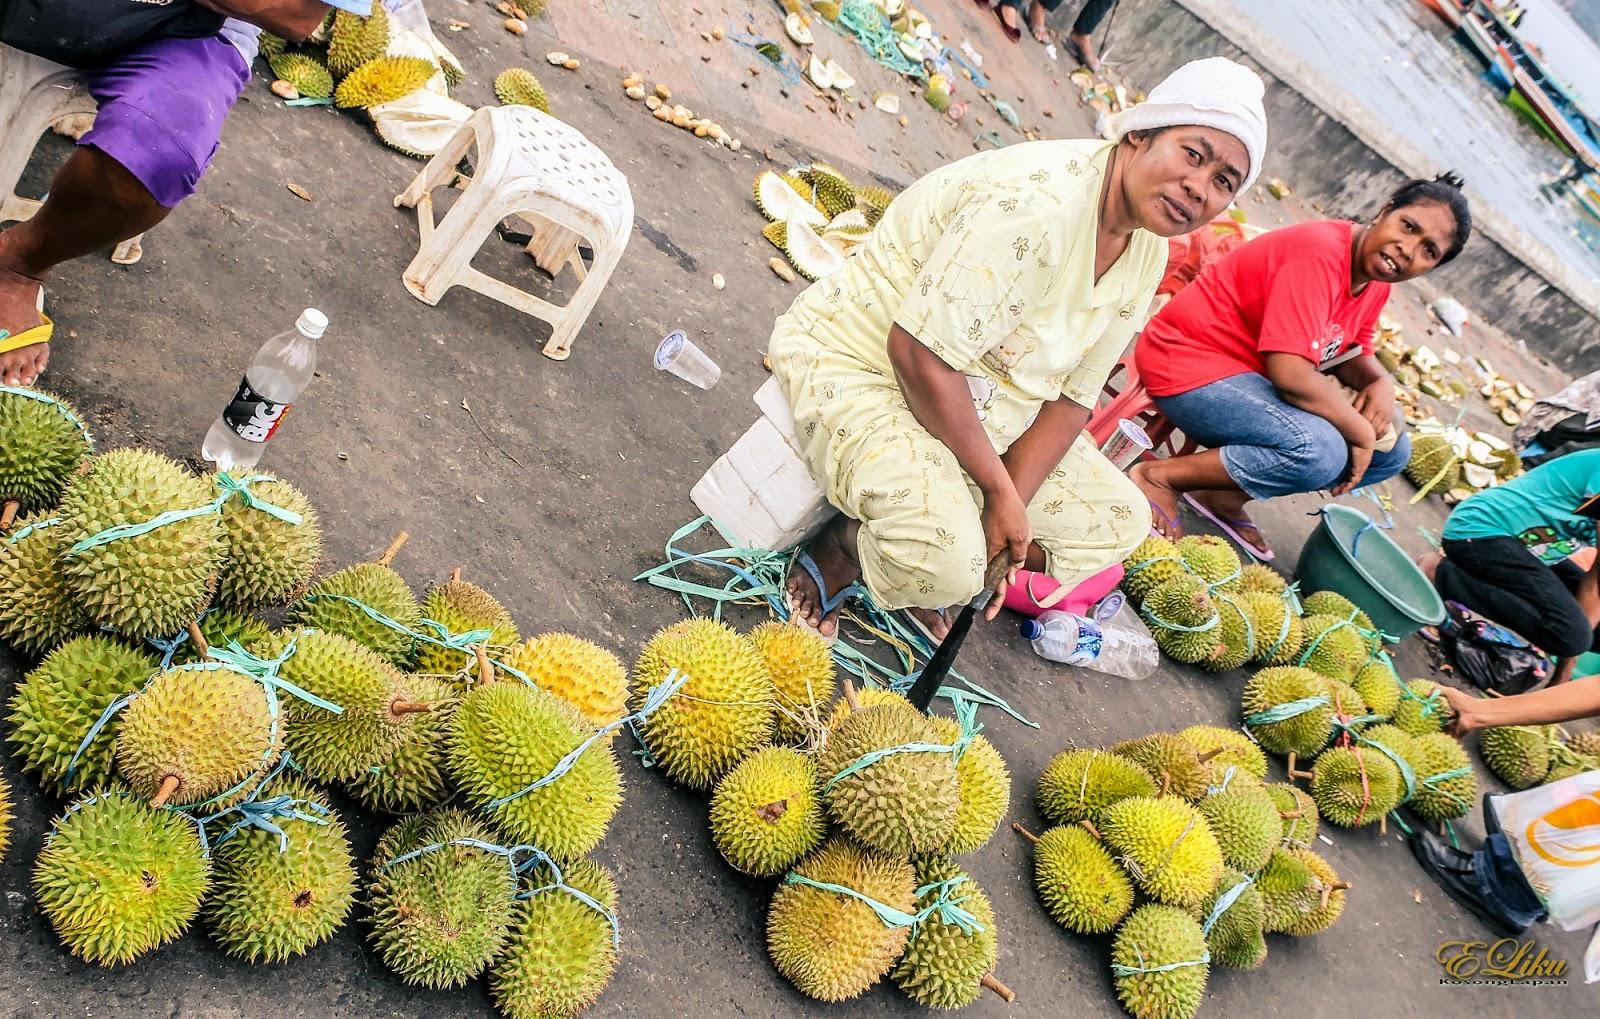 Banjir durian di Ambon | Sumber: Maluku Manise